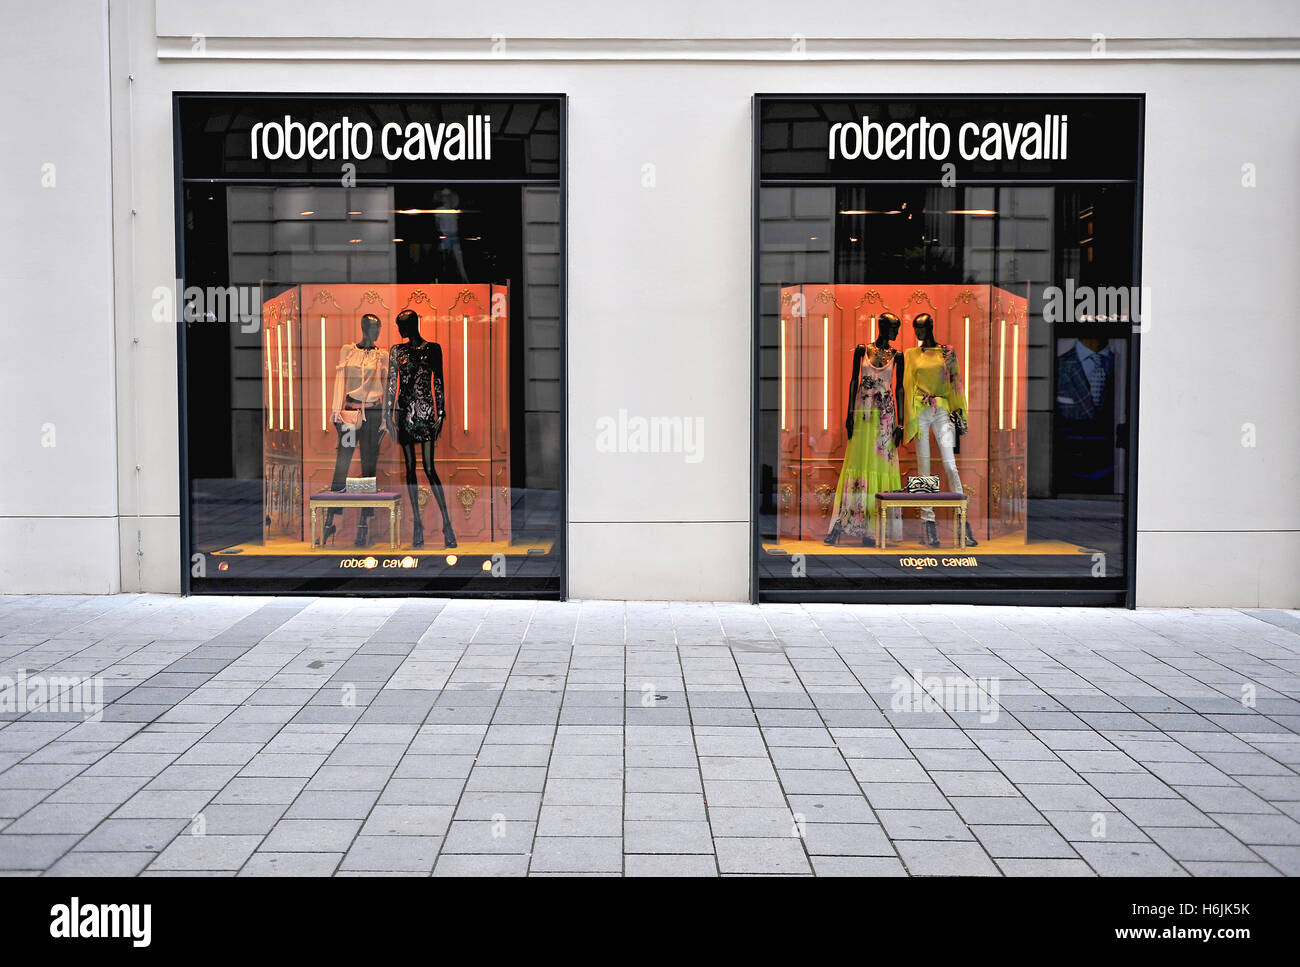 VIENNA, AUSTRIA - JUNE 6: Facade of Roberto Cavalli flagship store in Vienna on June 6, 2016. Roberto Cavalli is a world famous Stock Photo